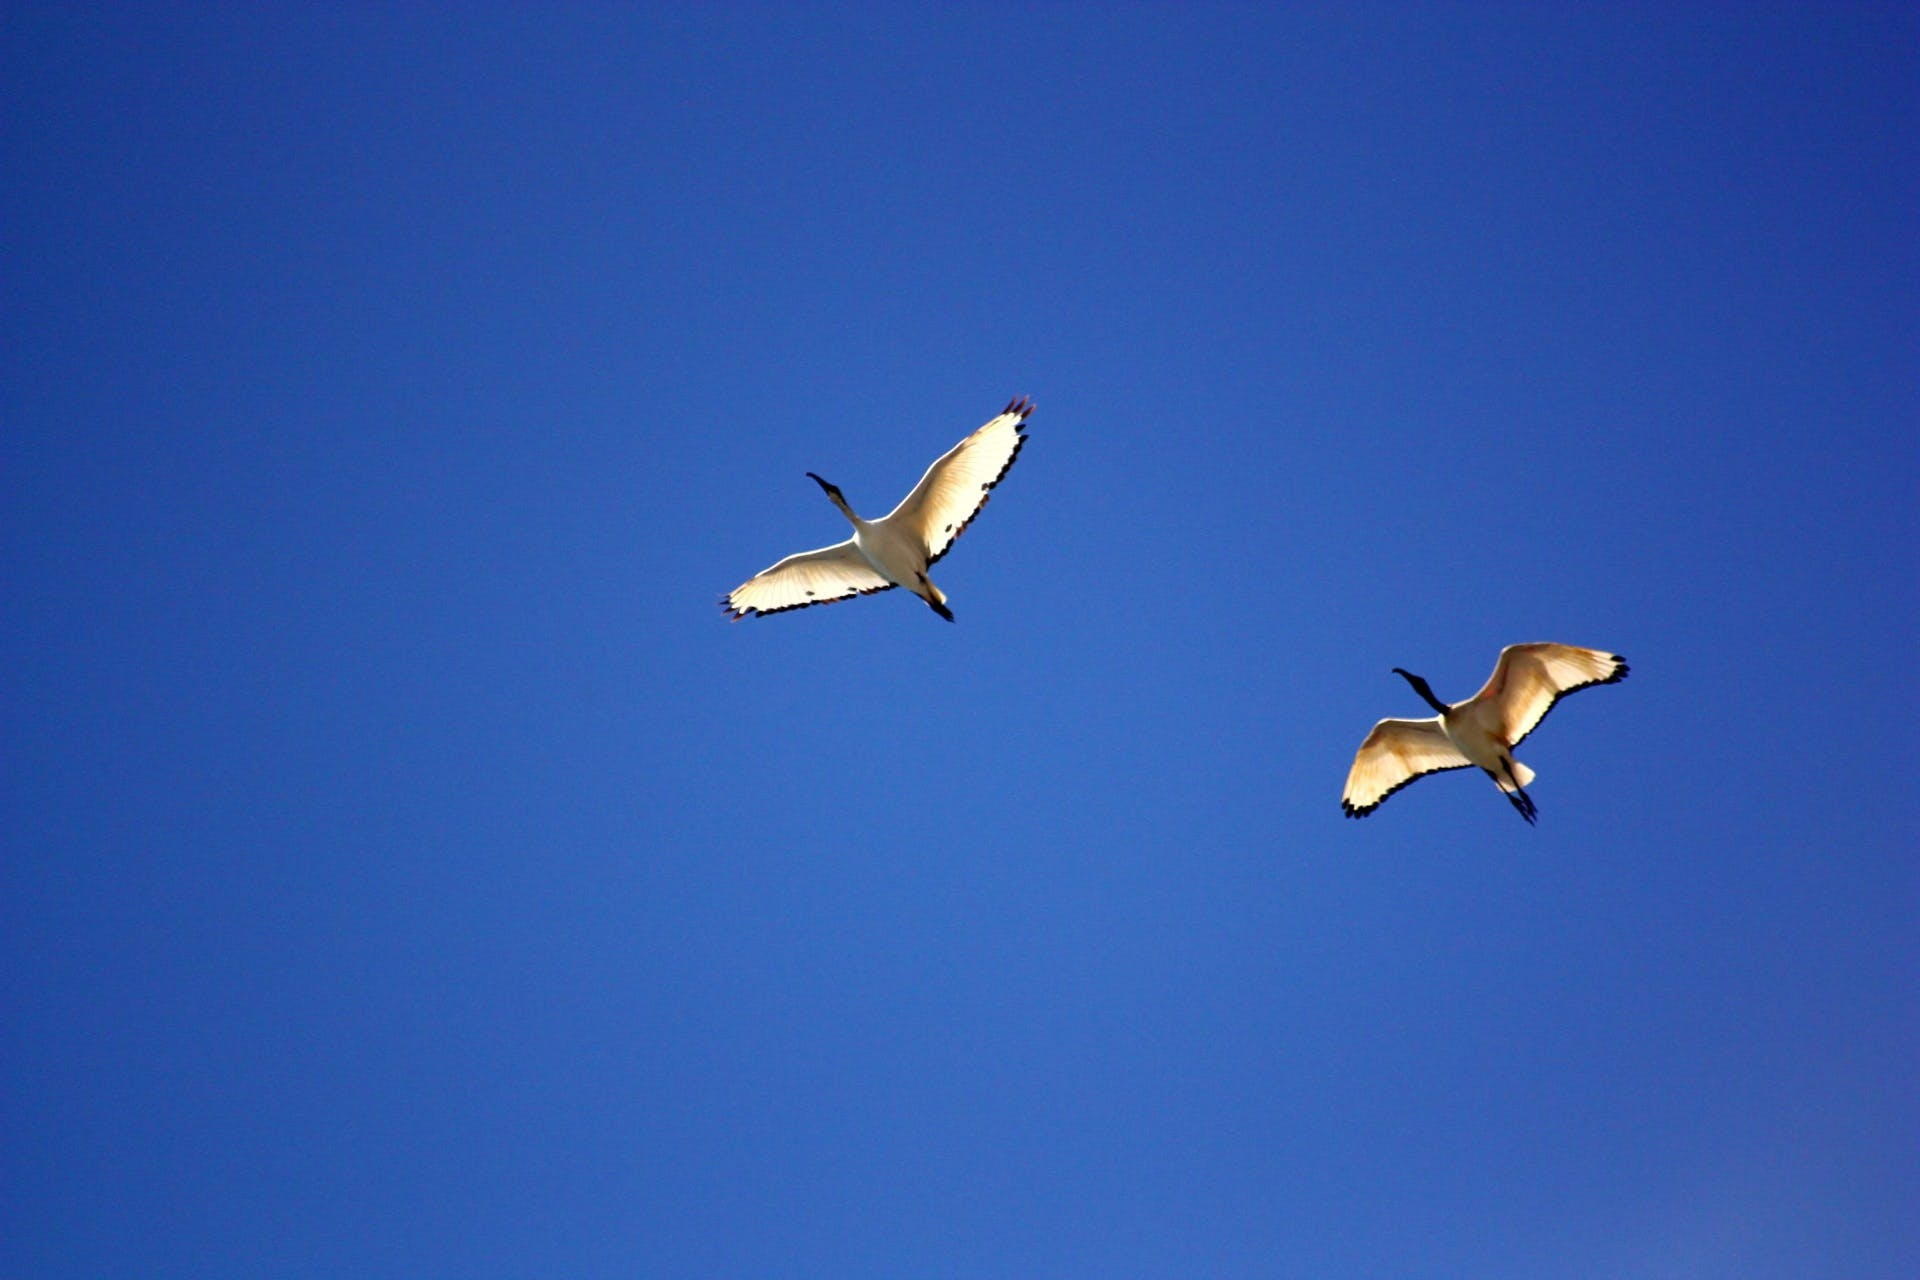 Sea Gull Flying Under Blue Sky during Daytime